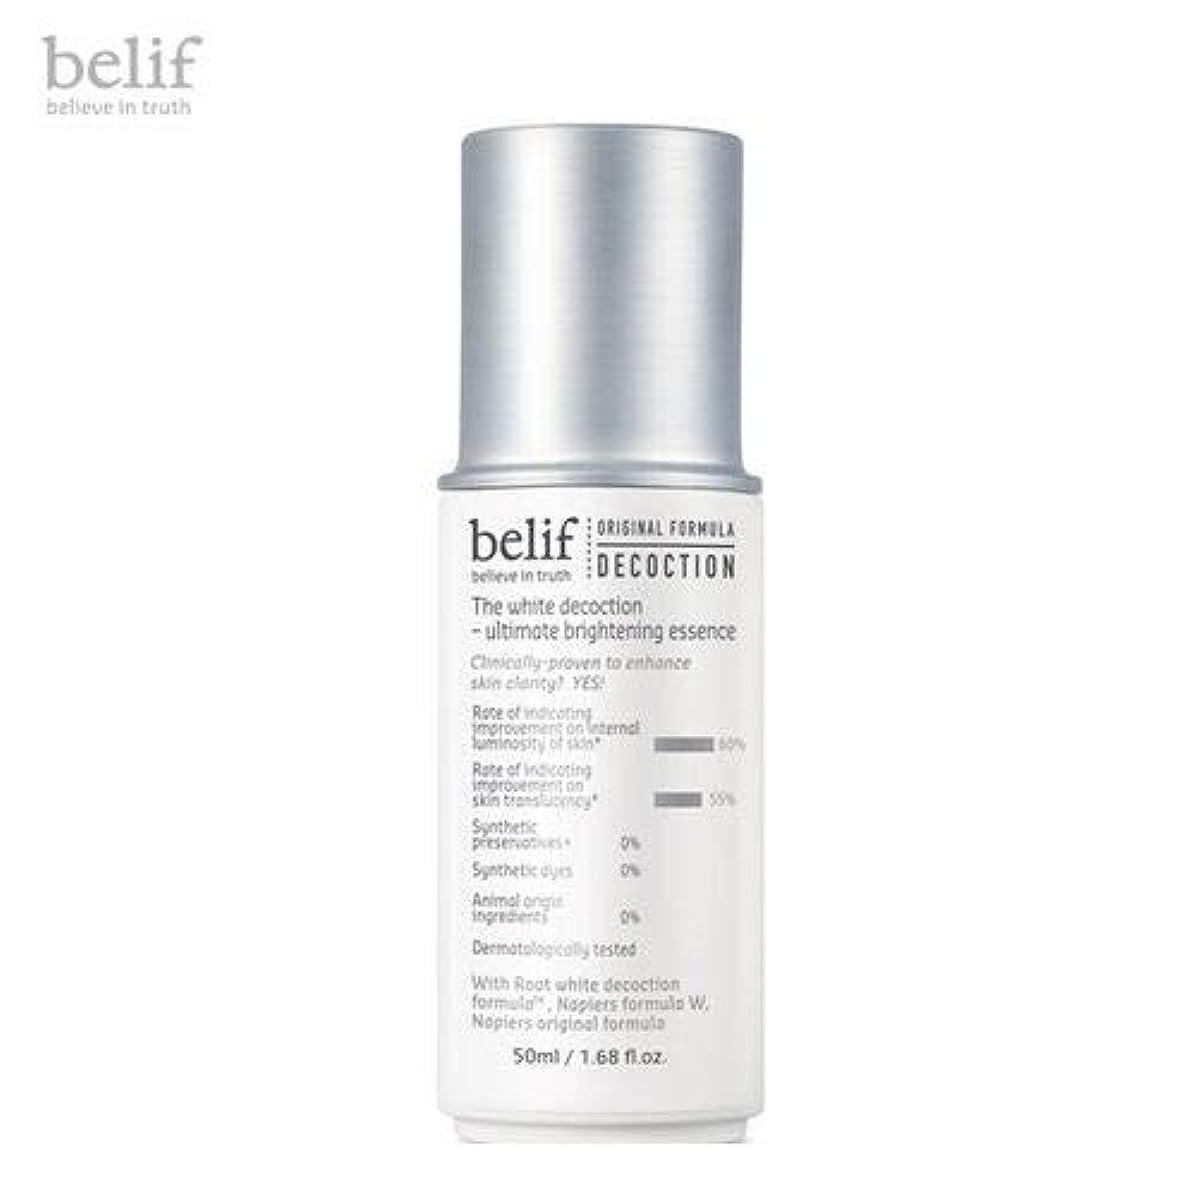 海藻顔料海藻belif The White Decoction - Ultimate Brightening Essence 50ml [並行輸入品]